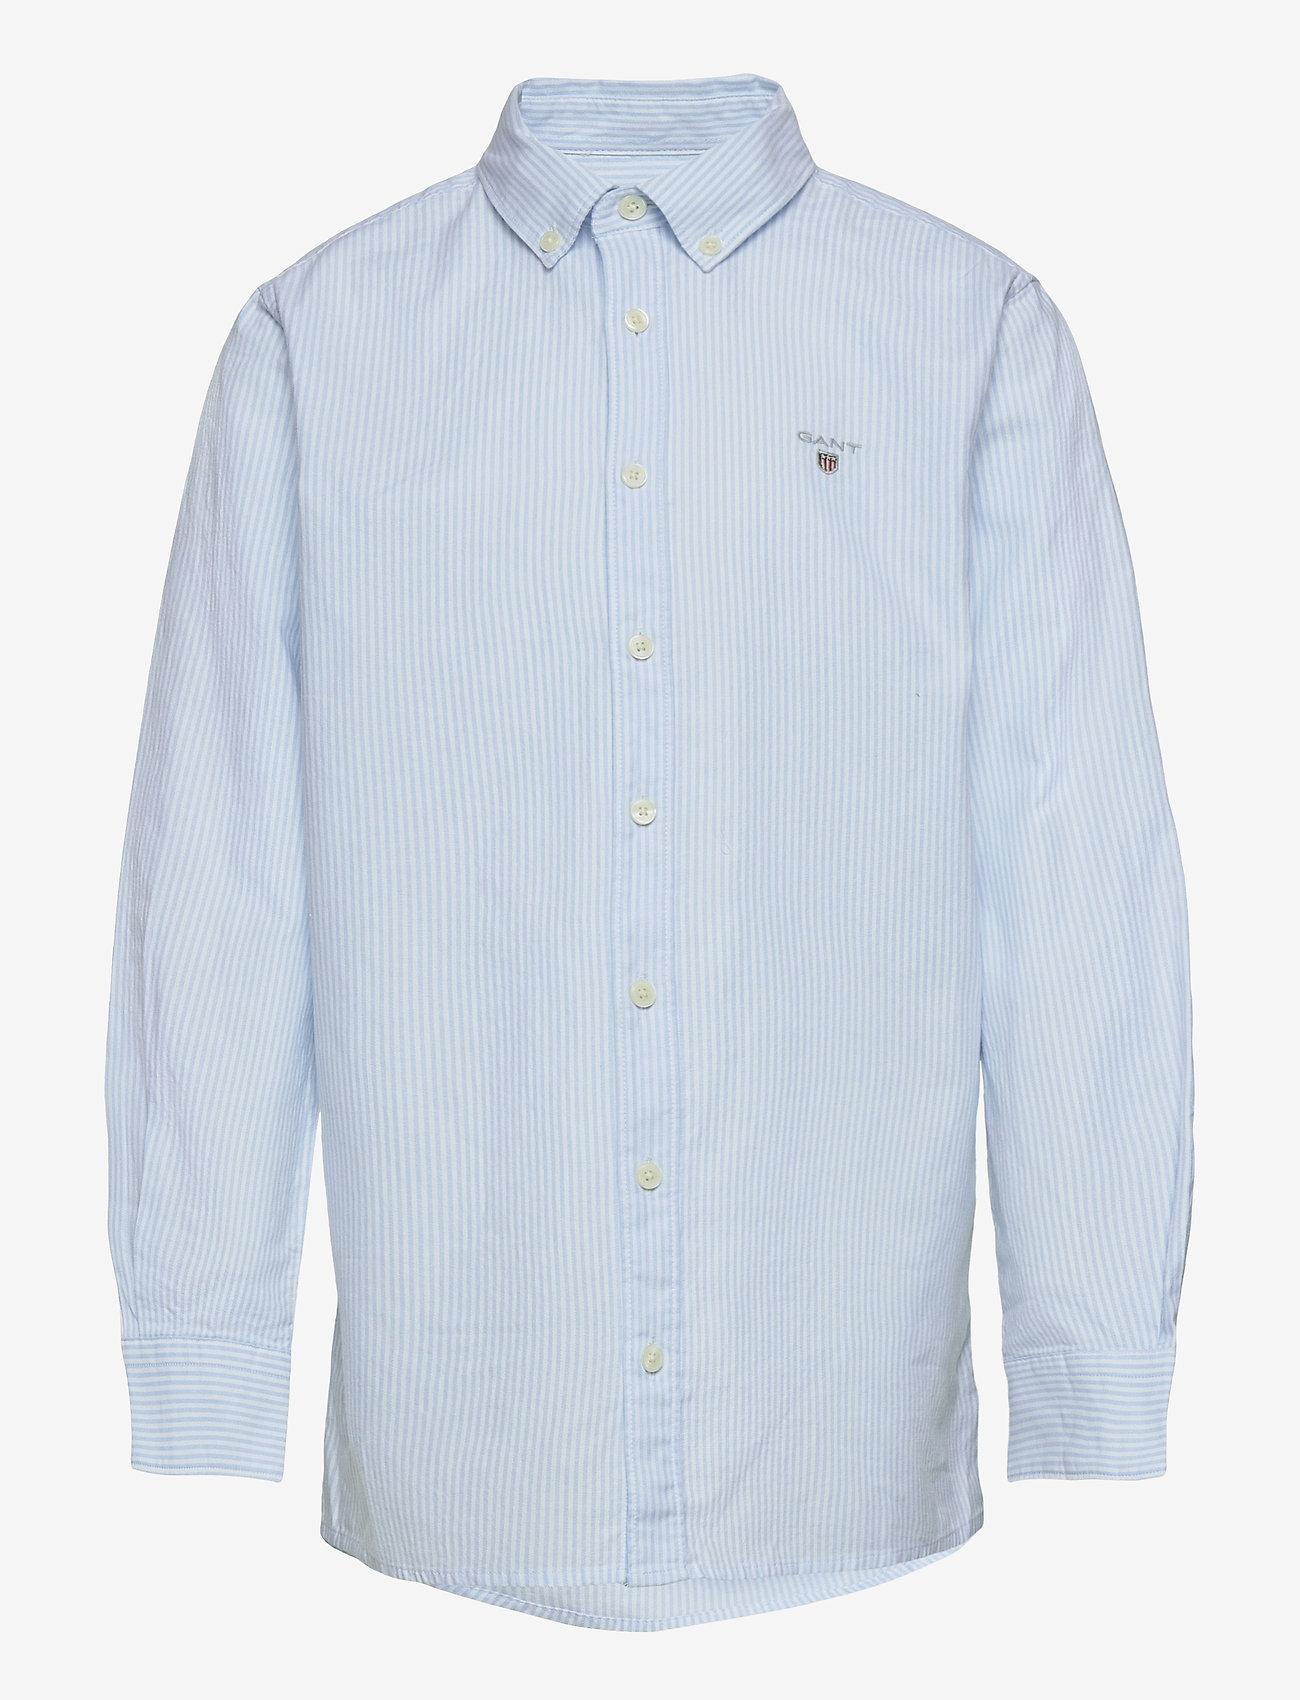 GANT - ARCHIVE OXFORD STRIPE BD SHIRT - shirts - capri blue - 0